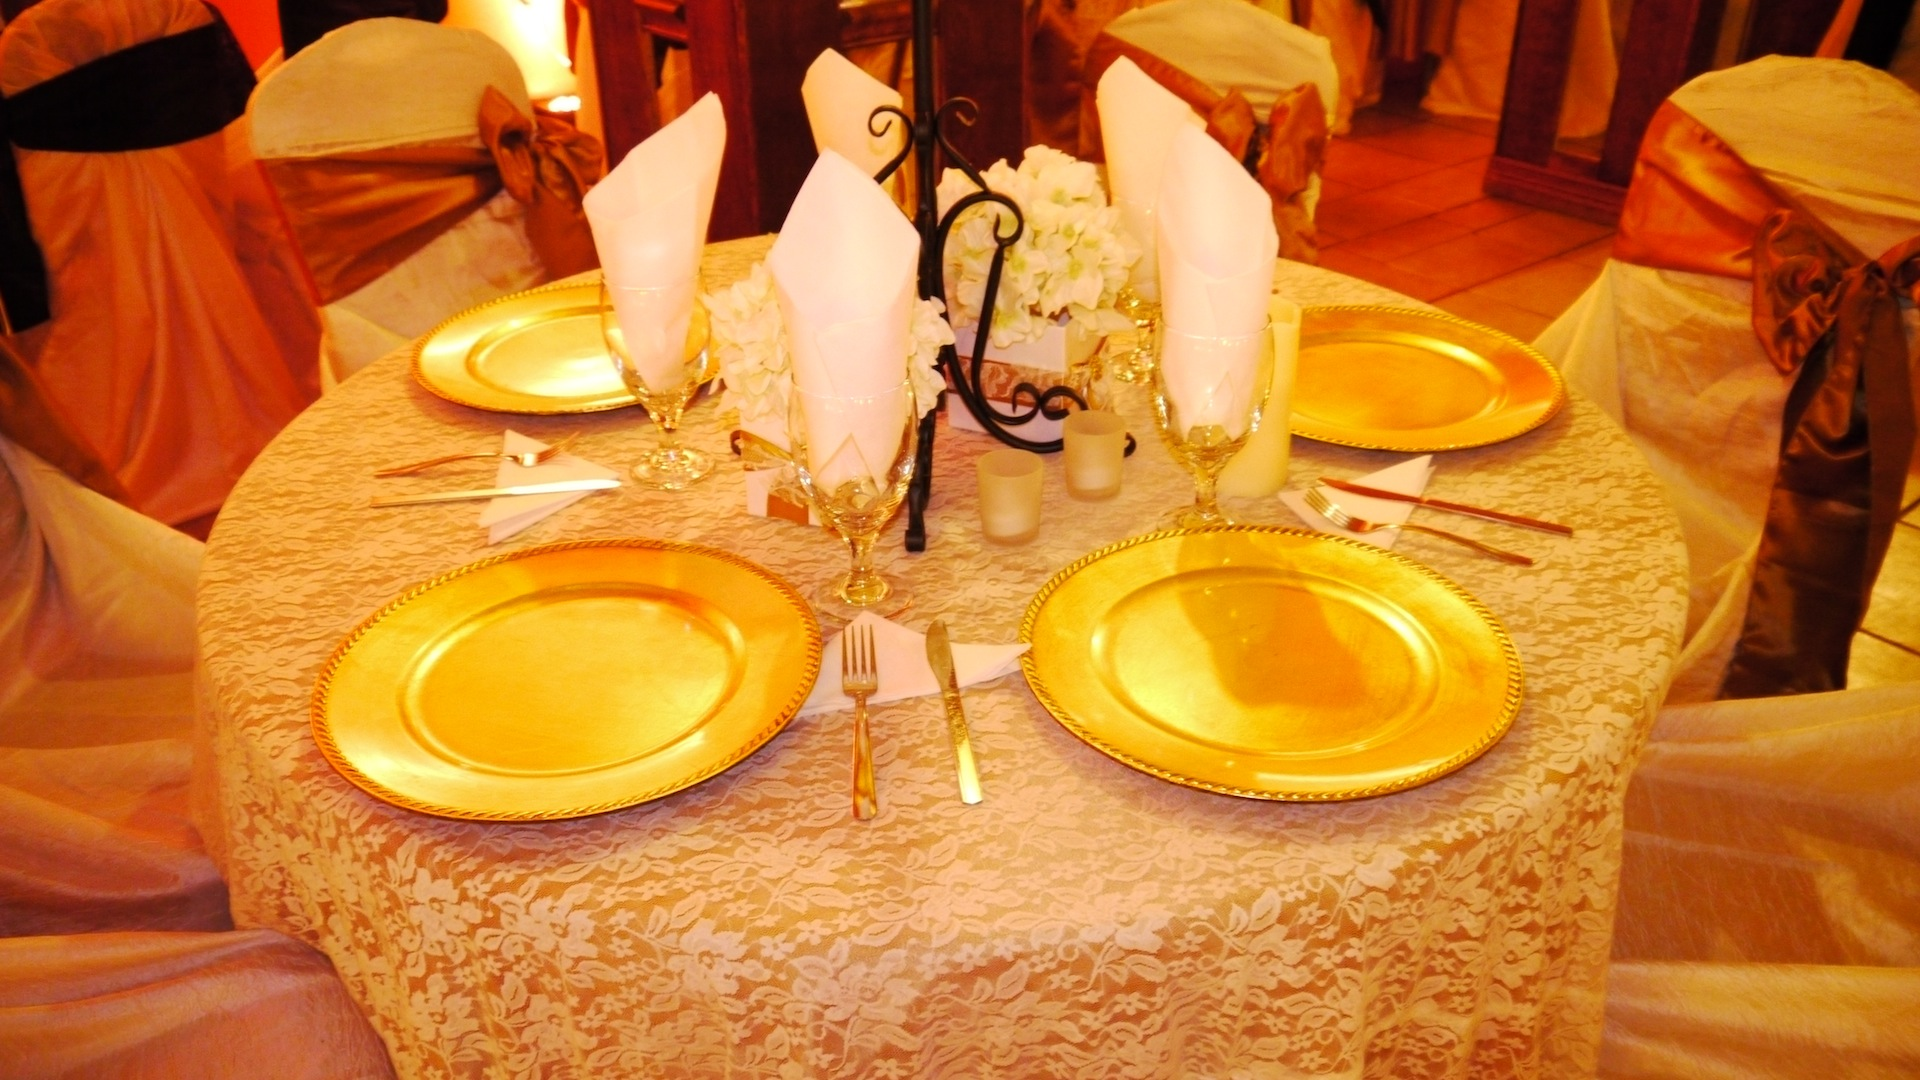 Herreras Reception Hall Amber LED Uplights Table Setting